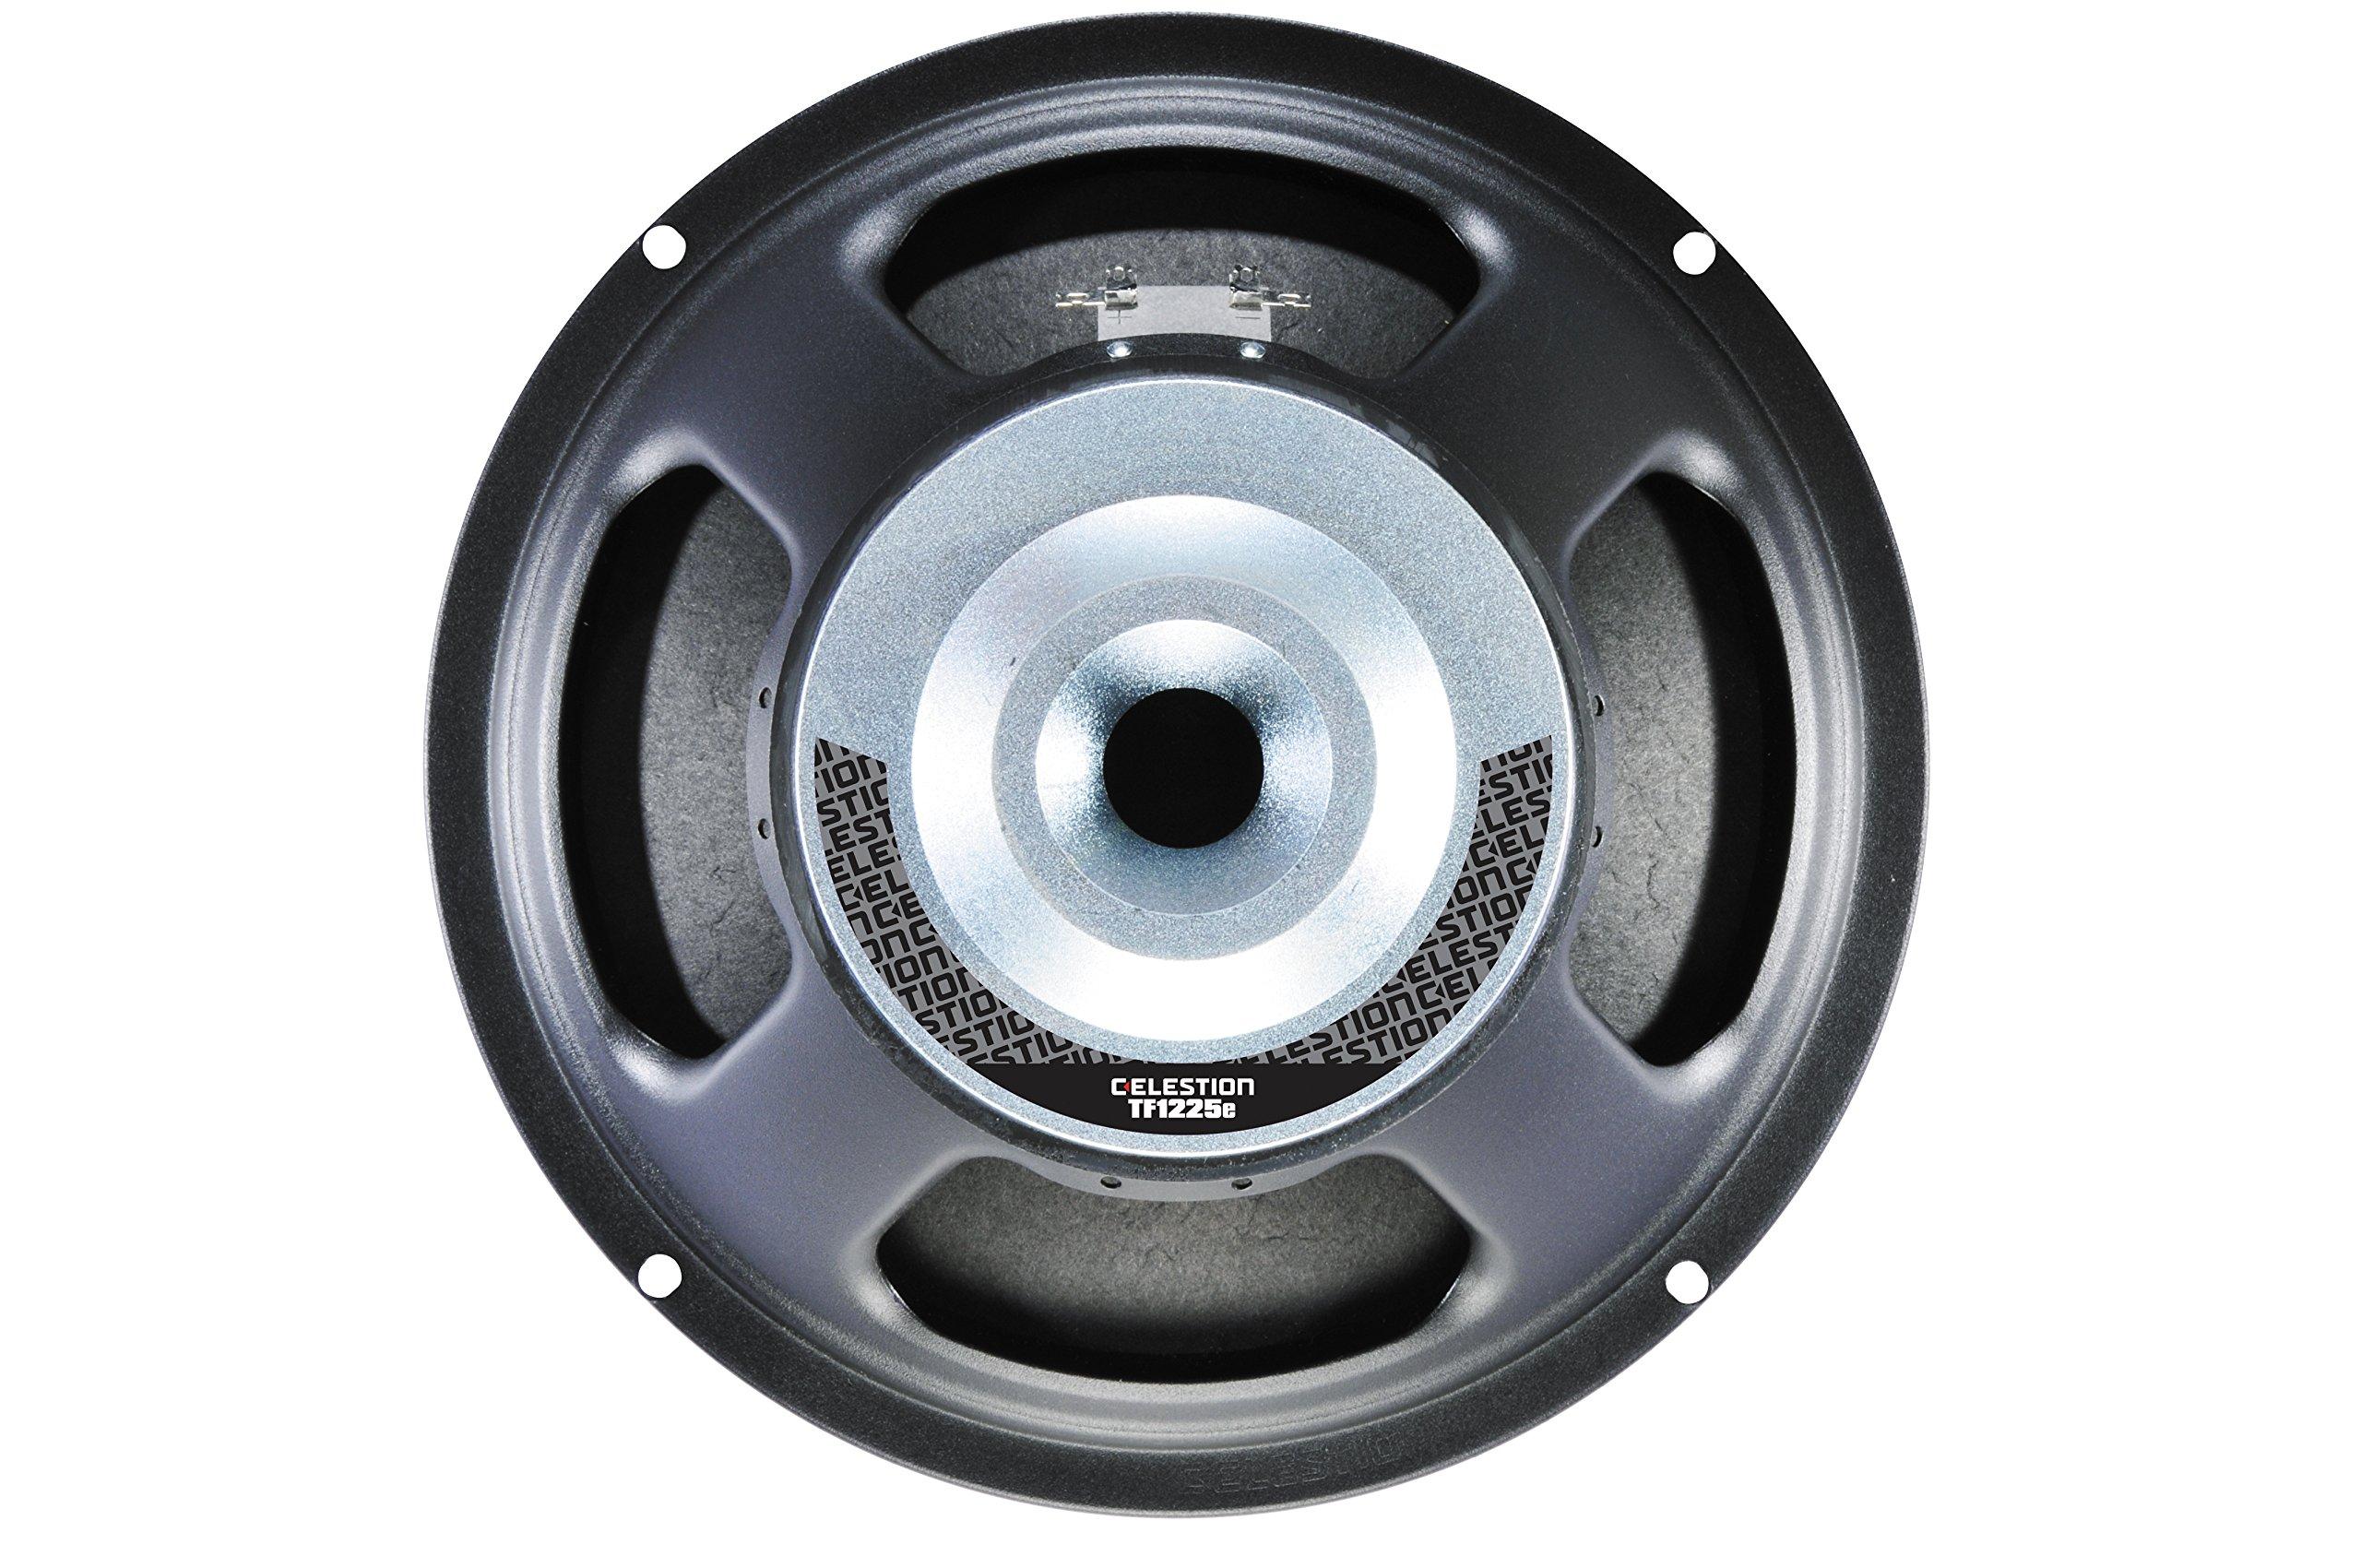 Celestion TF 1225e 300 Watt Raw Frame Speaker 8 Ohm, 12 inch by CELESTION